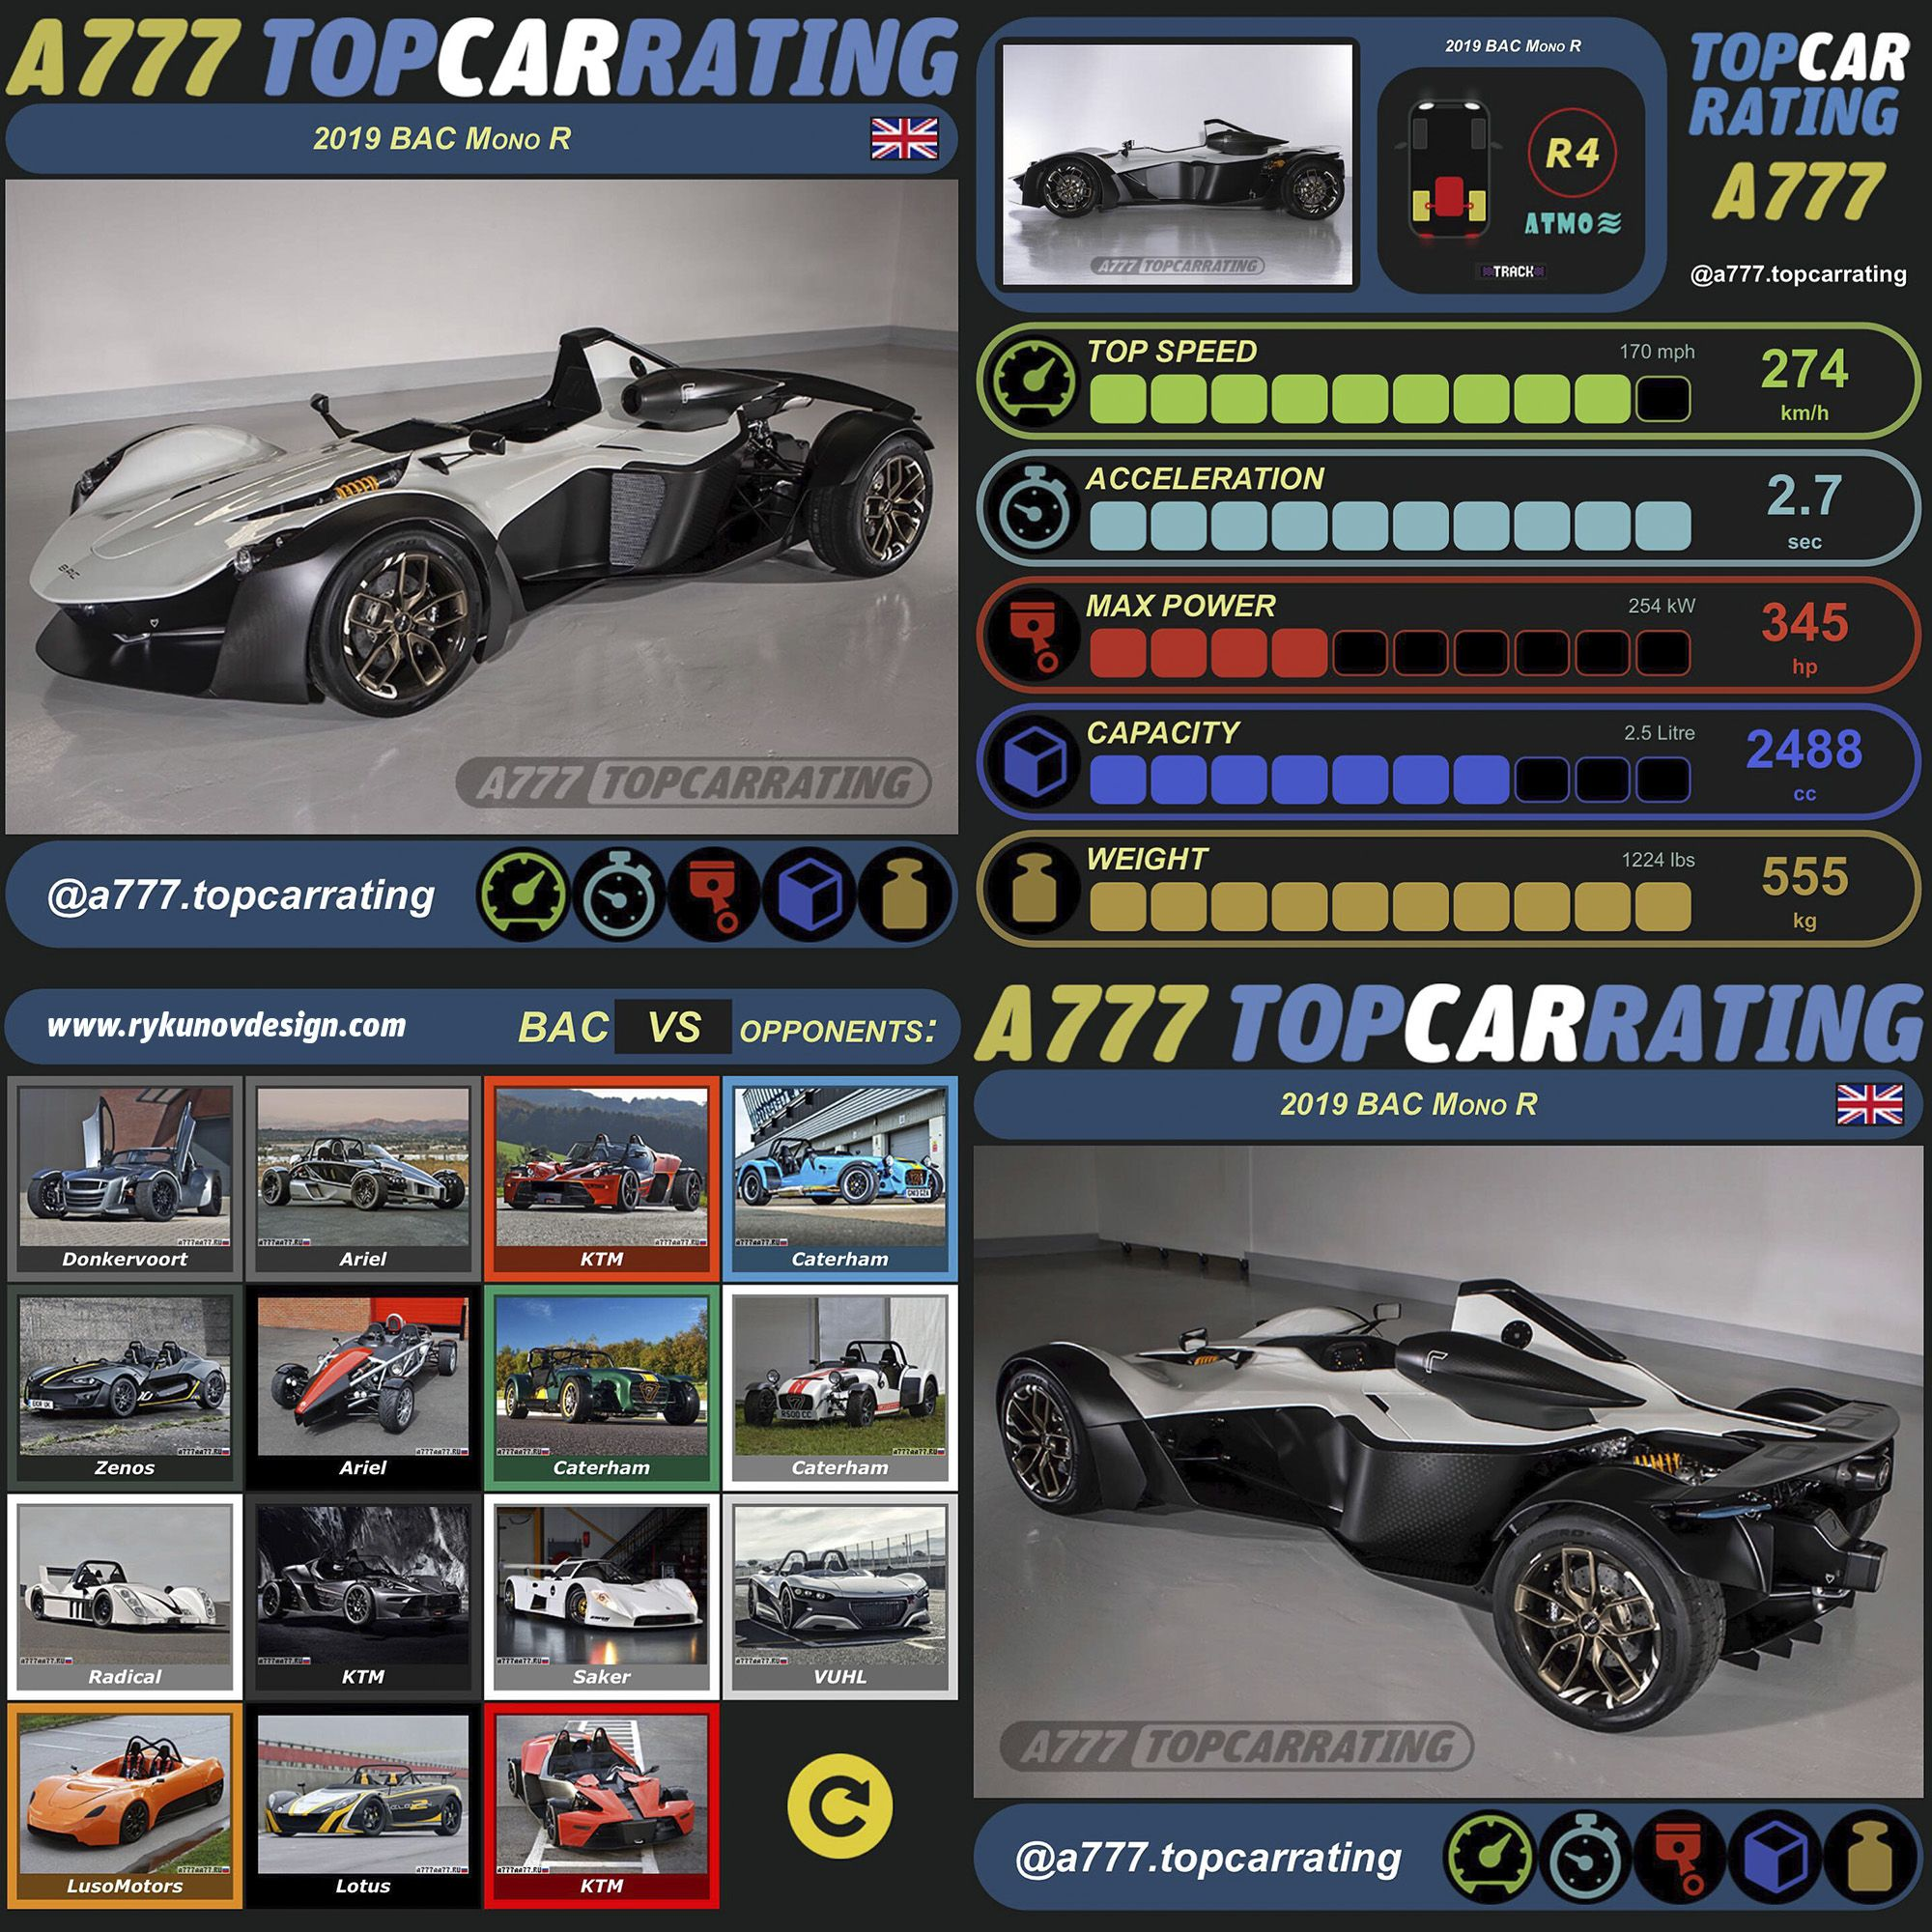 Top Speed 274 Km H 170 Mph 0 100 Km H 0 62 Mph 2 7 Seconds Power